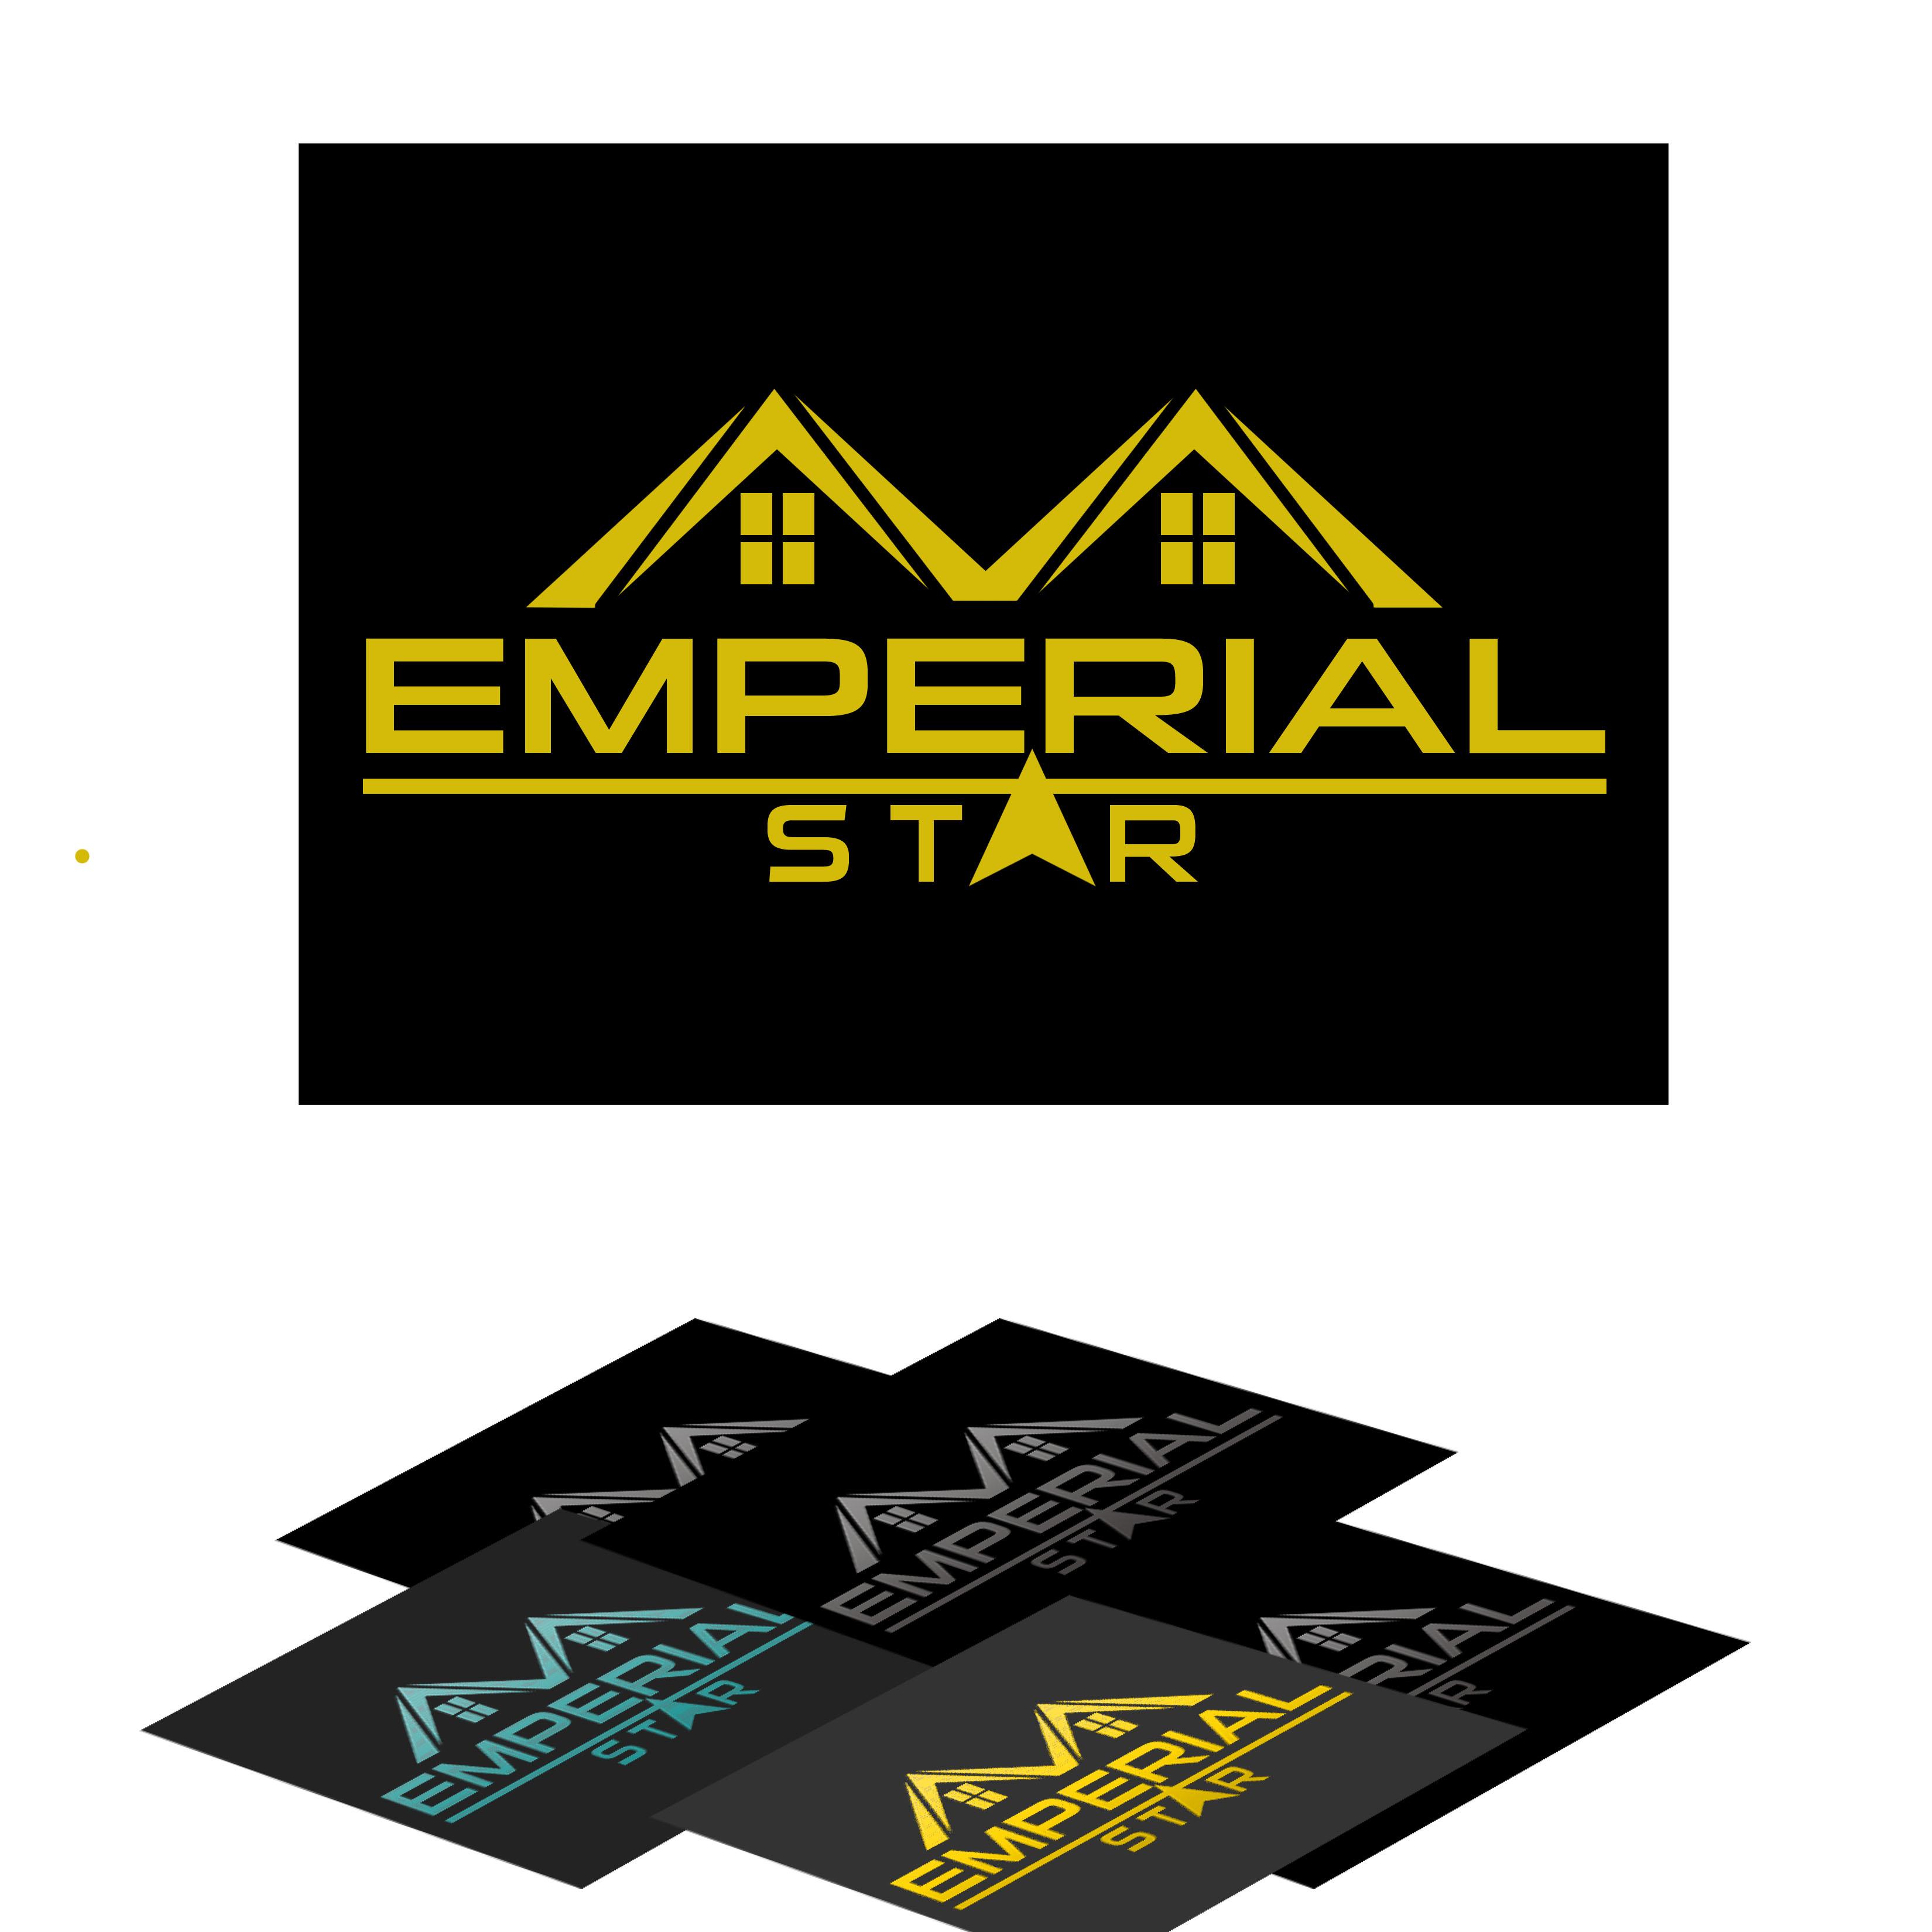 Logo Design by Alan Esclamado - Entry No. 3 in the Logo Design Contest Emperial Star Logo Design.